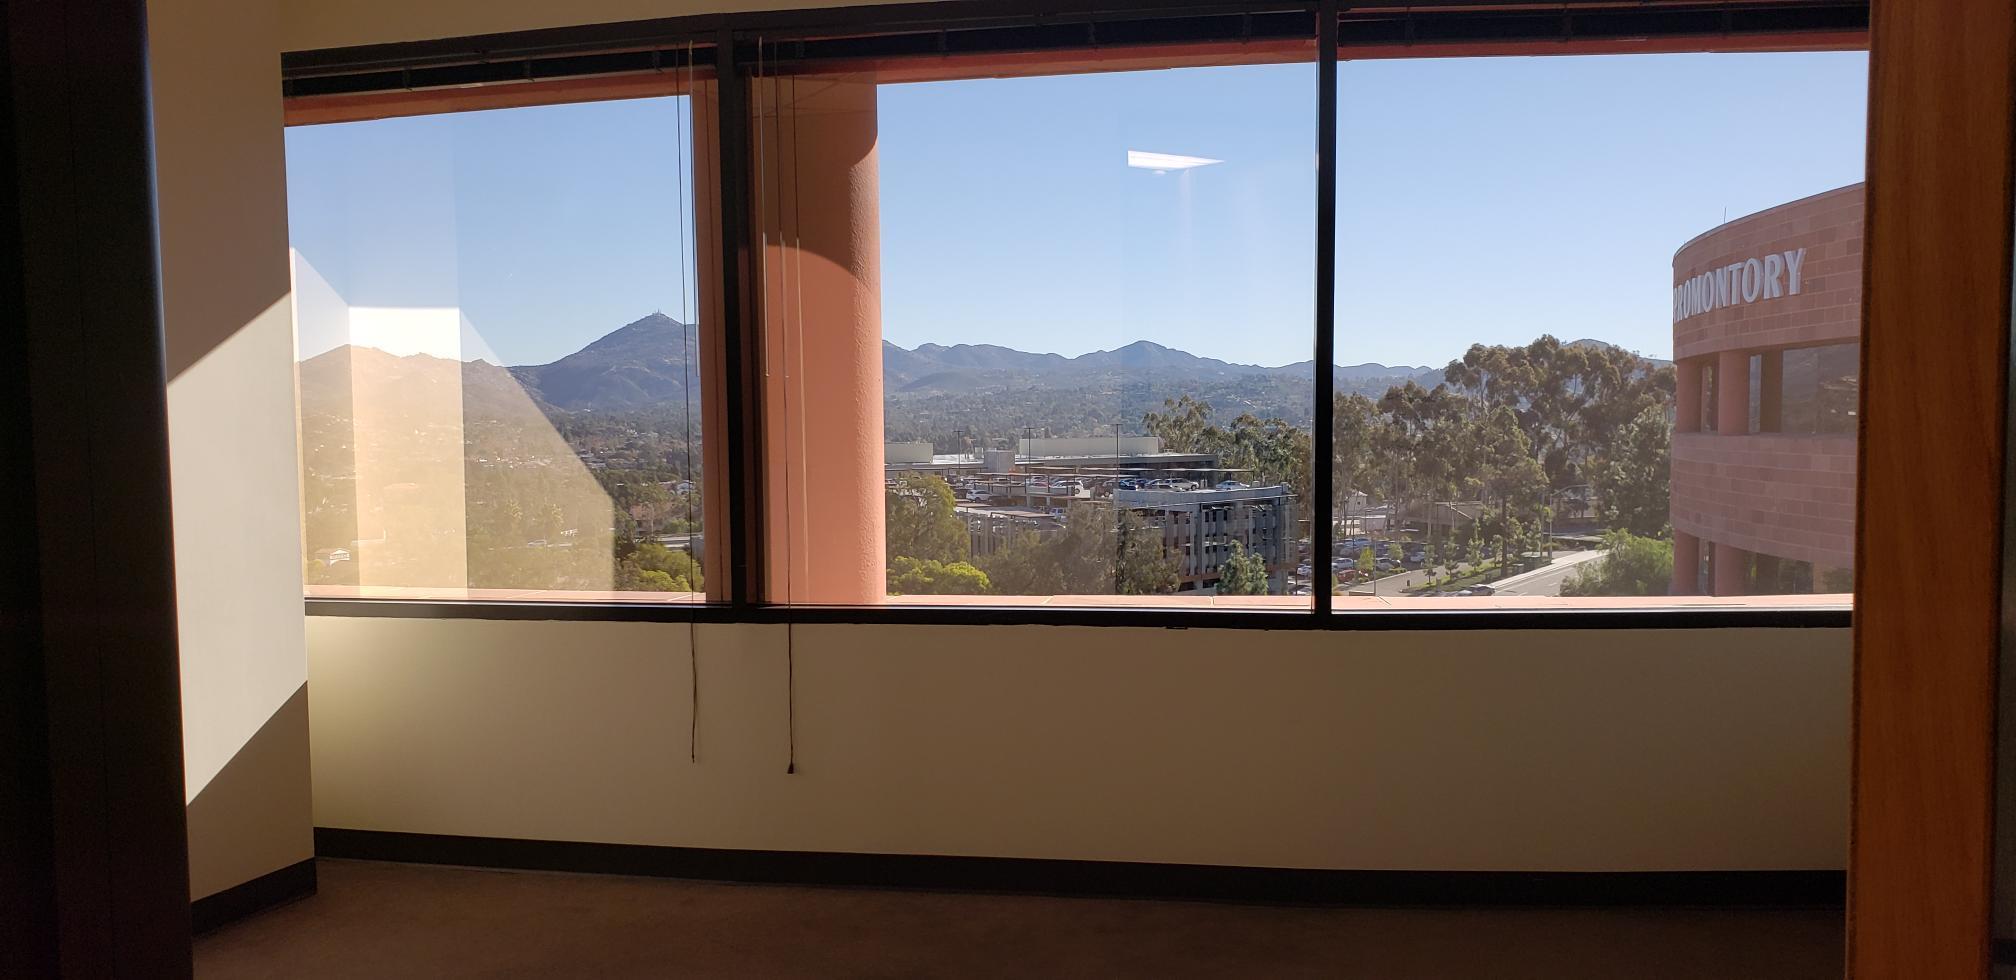 (RB1) Rancho Bernardo - 2 Office Mini-Suite #359 & #360